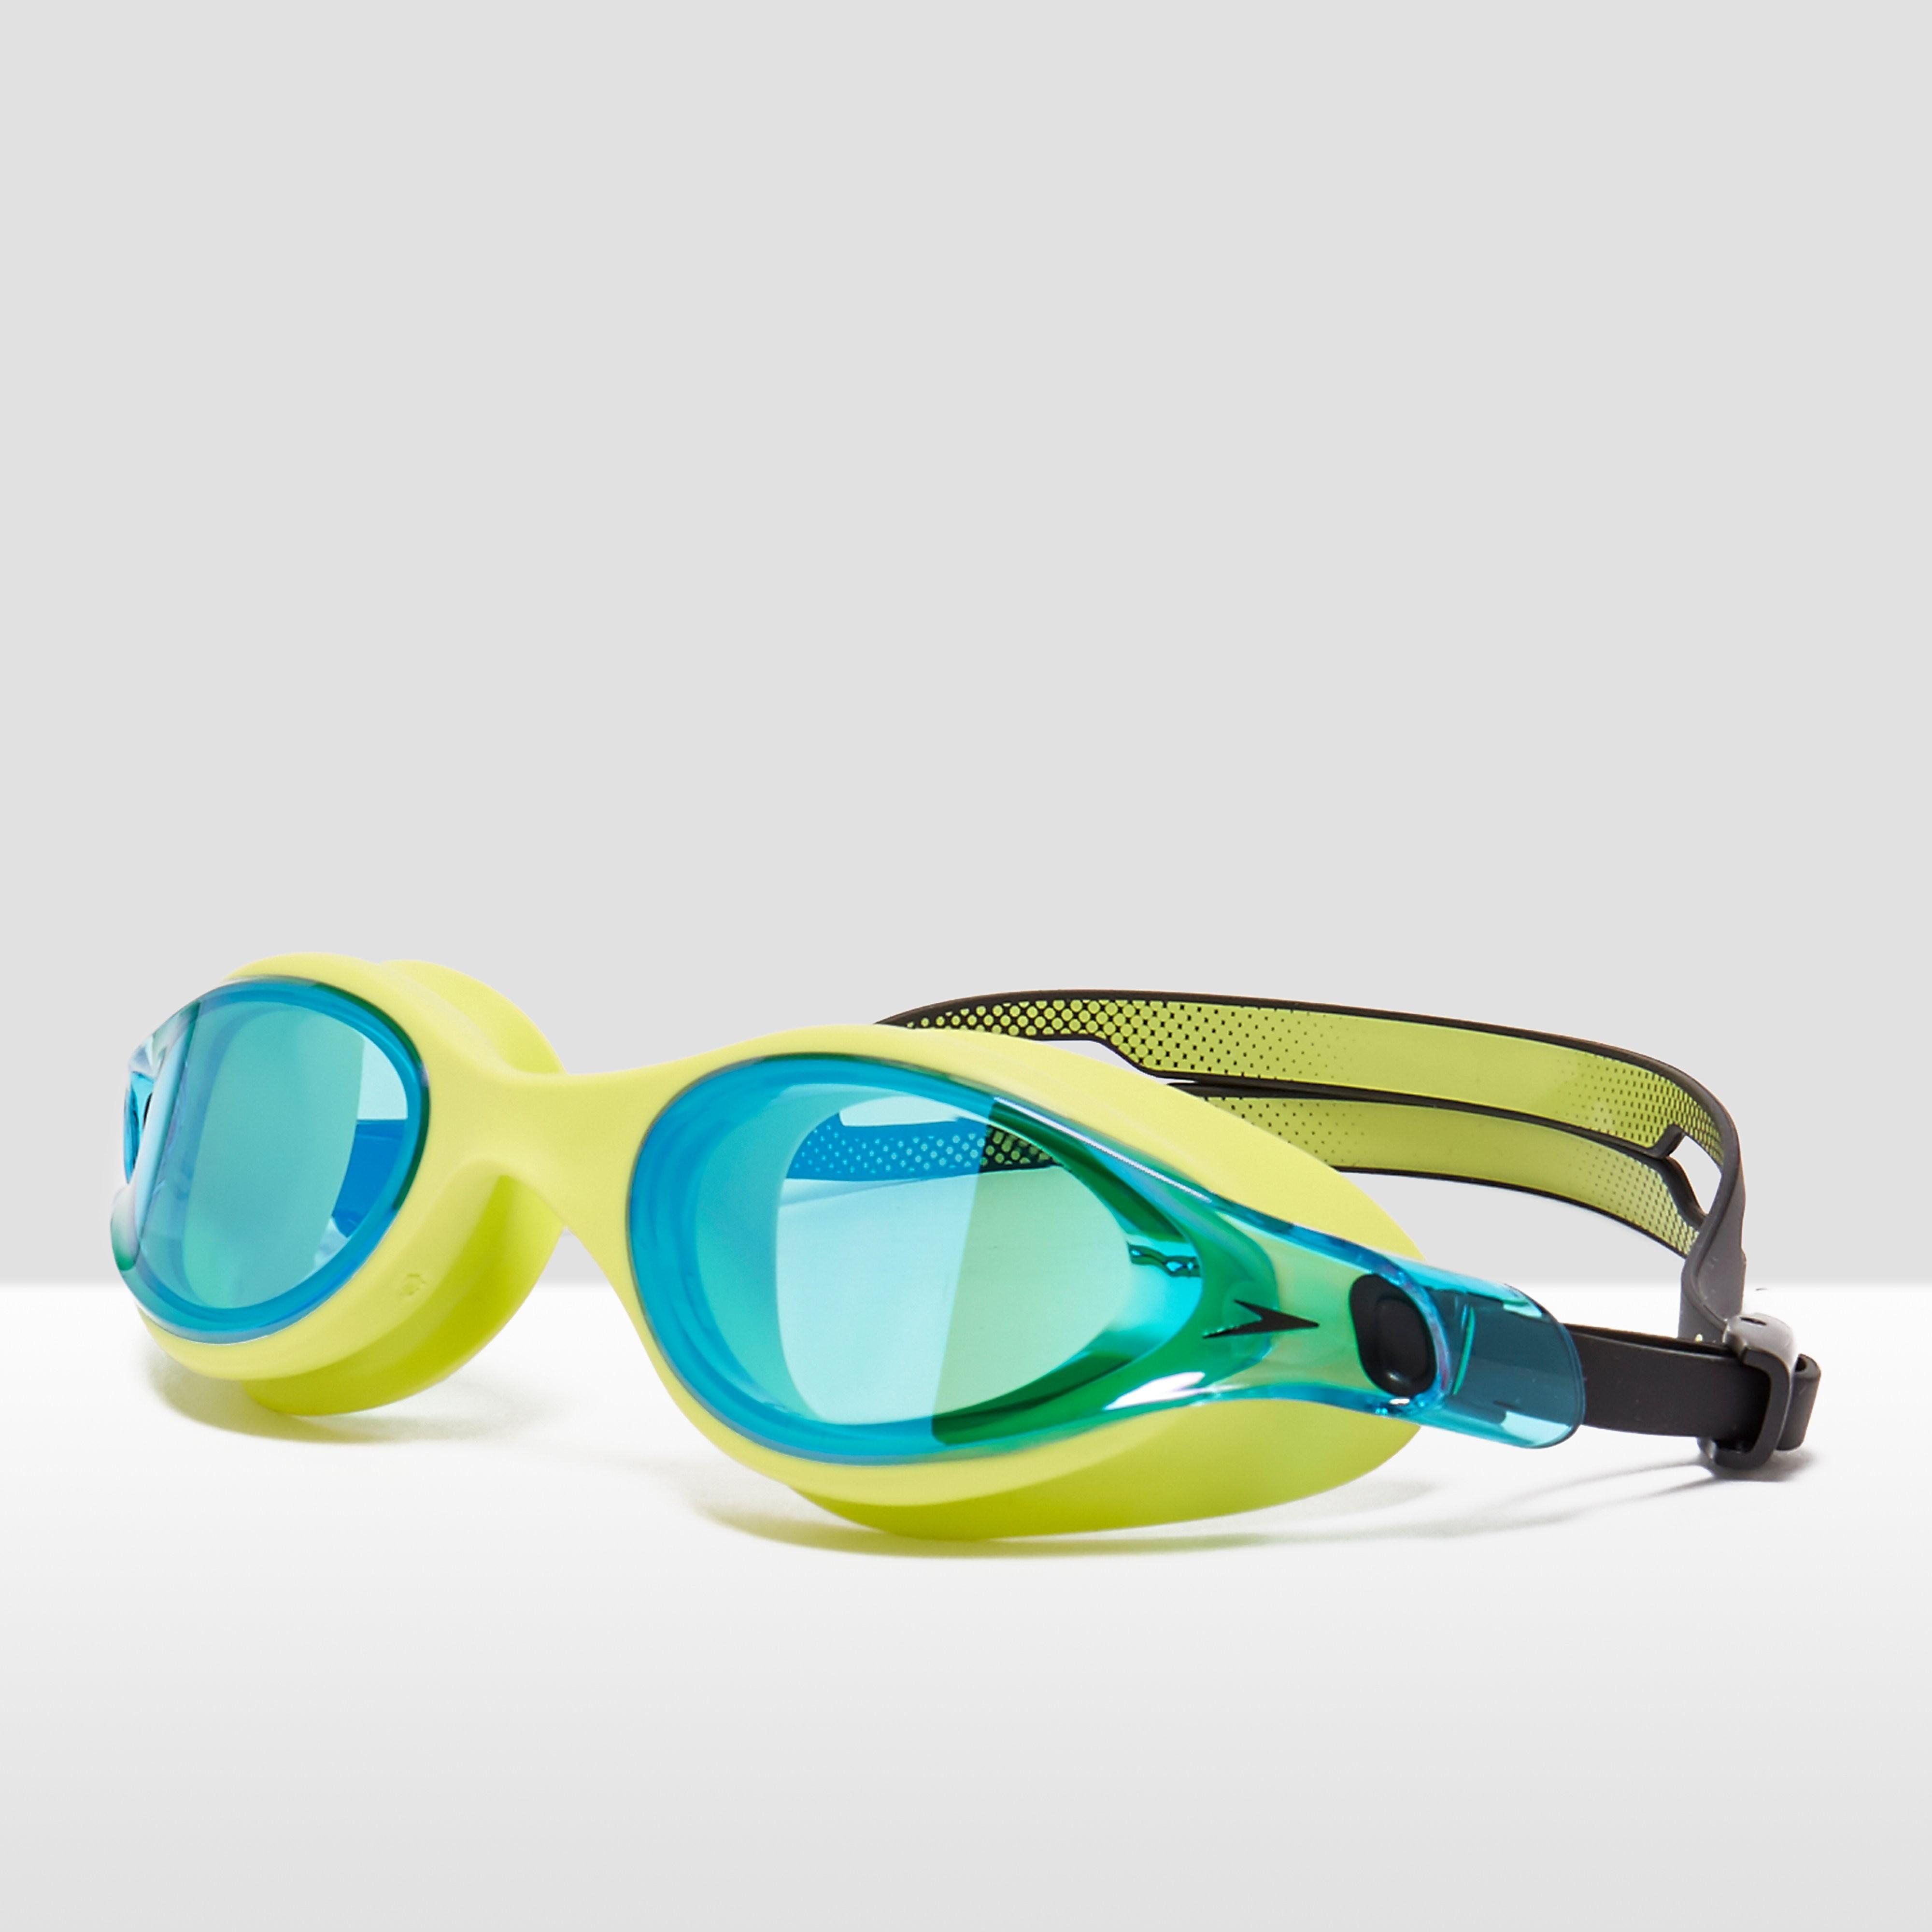 Speedo Unisex Vue Mirror Swimming Goggles